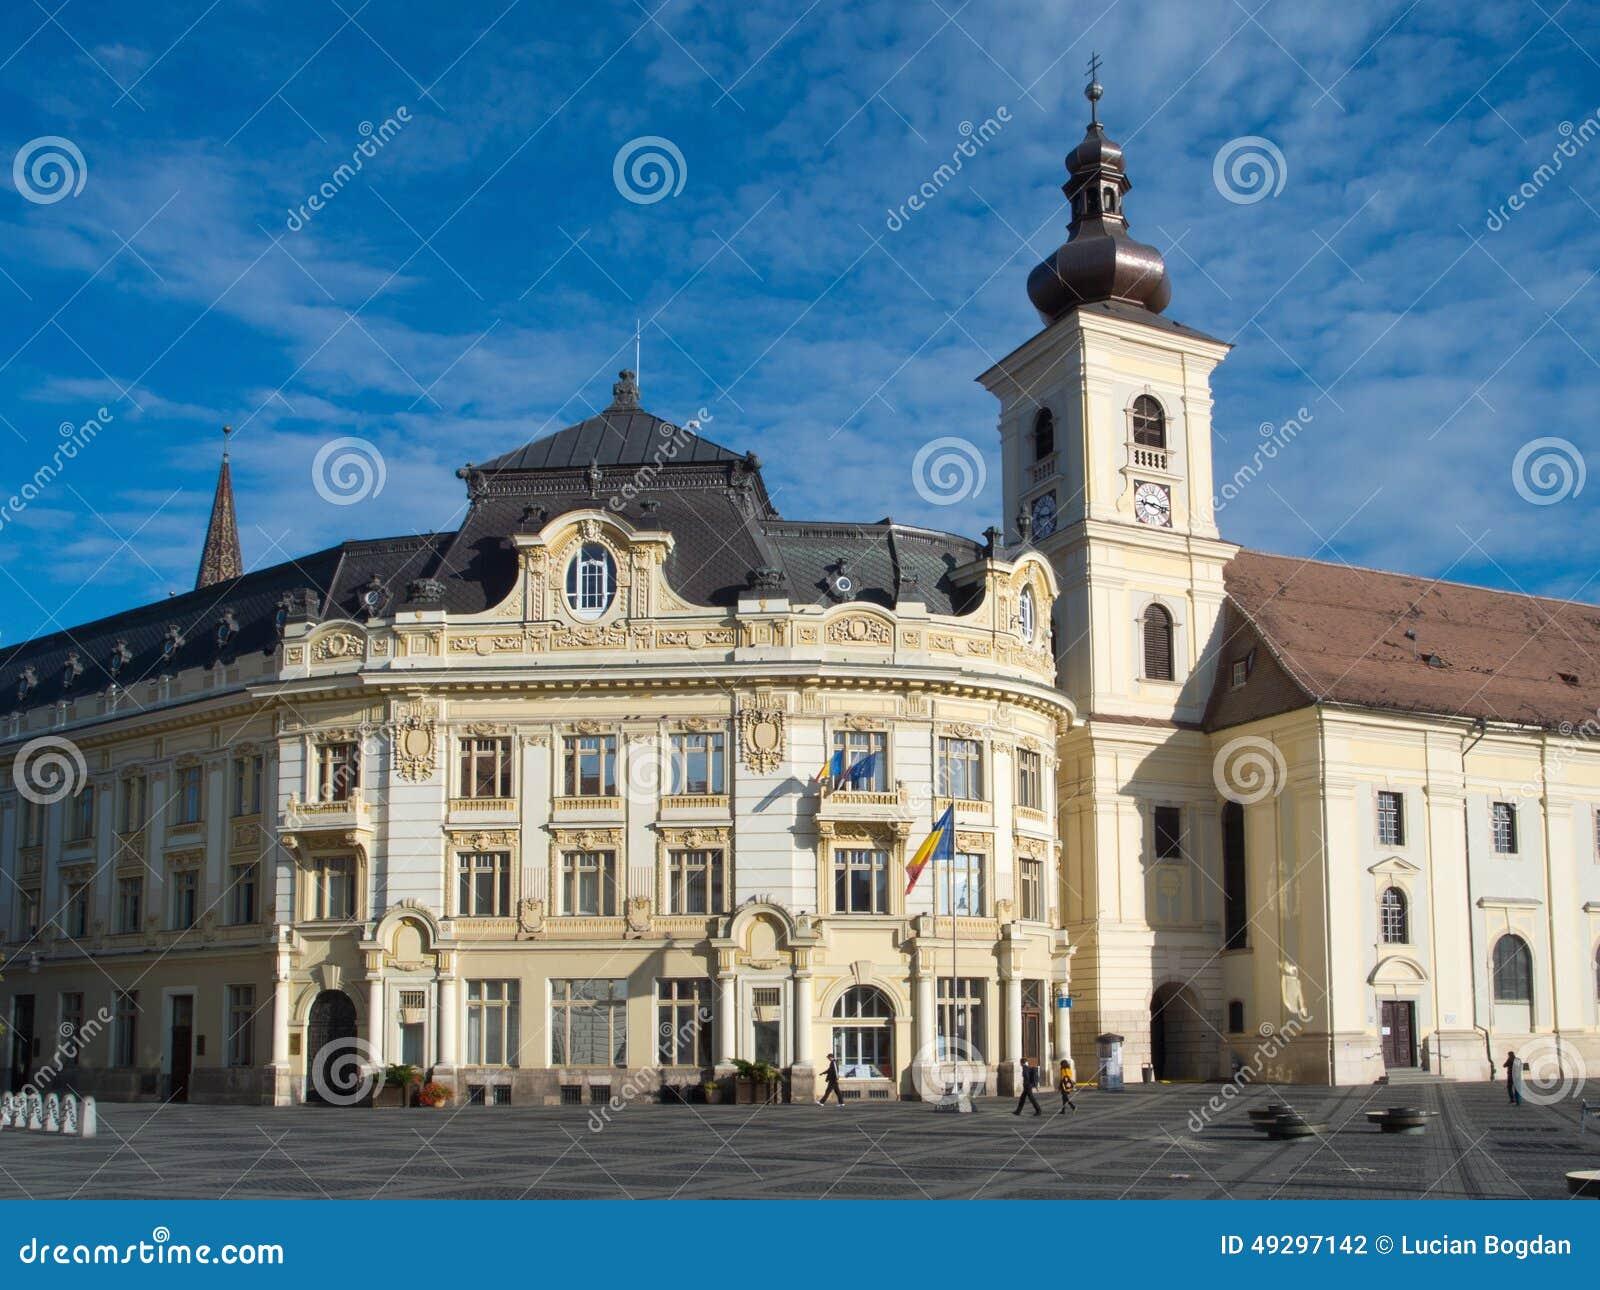 City Hall and Catholic Church of Sibiu